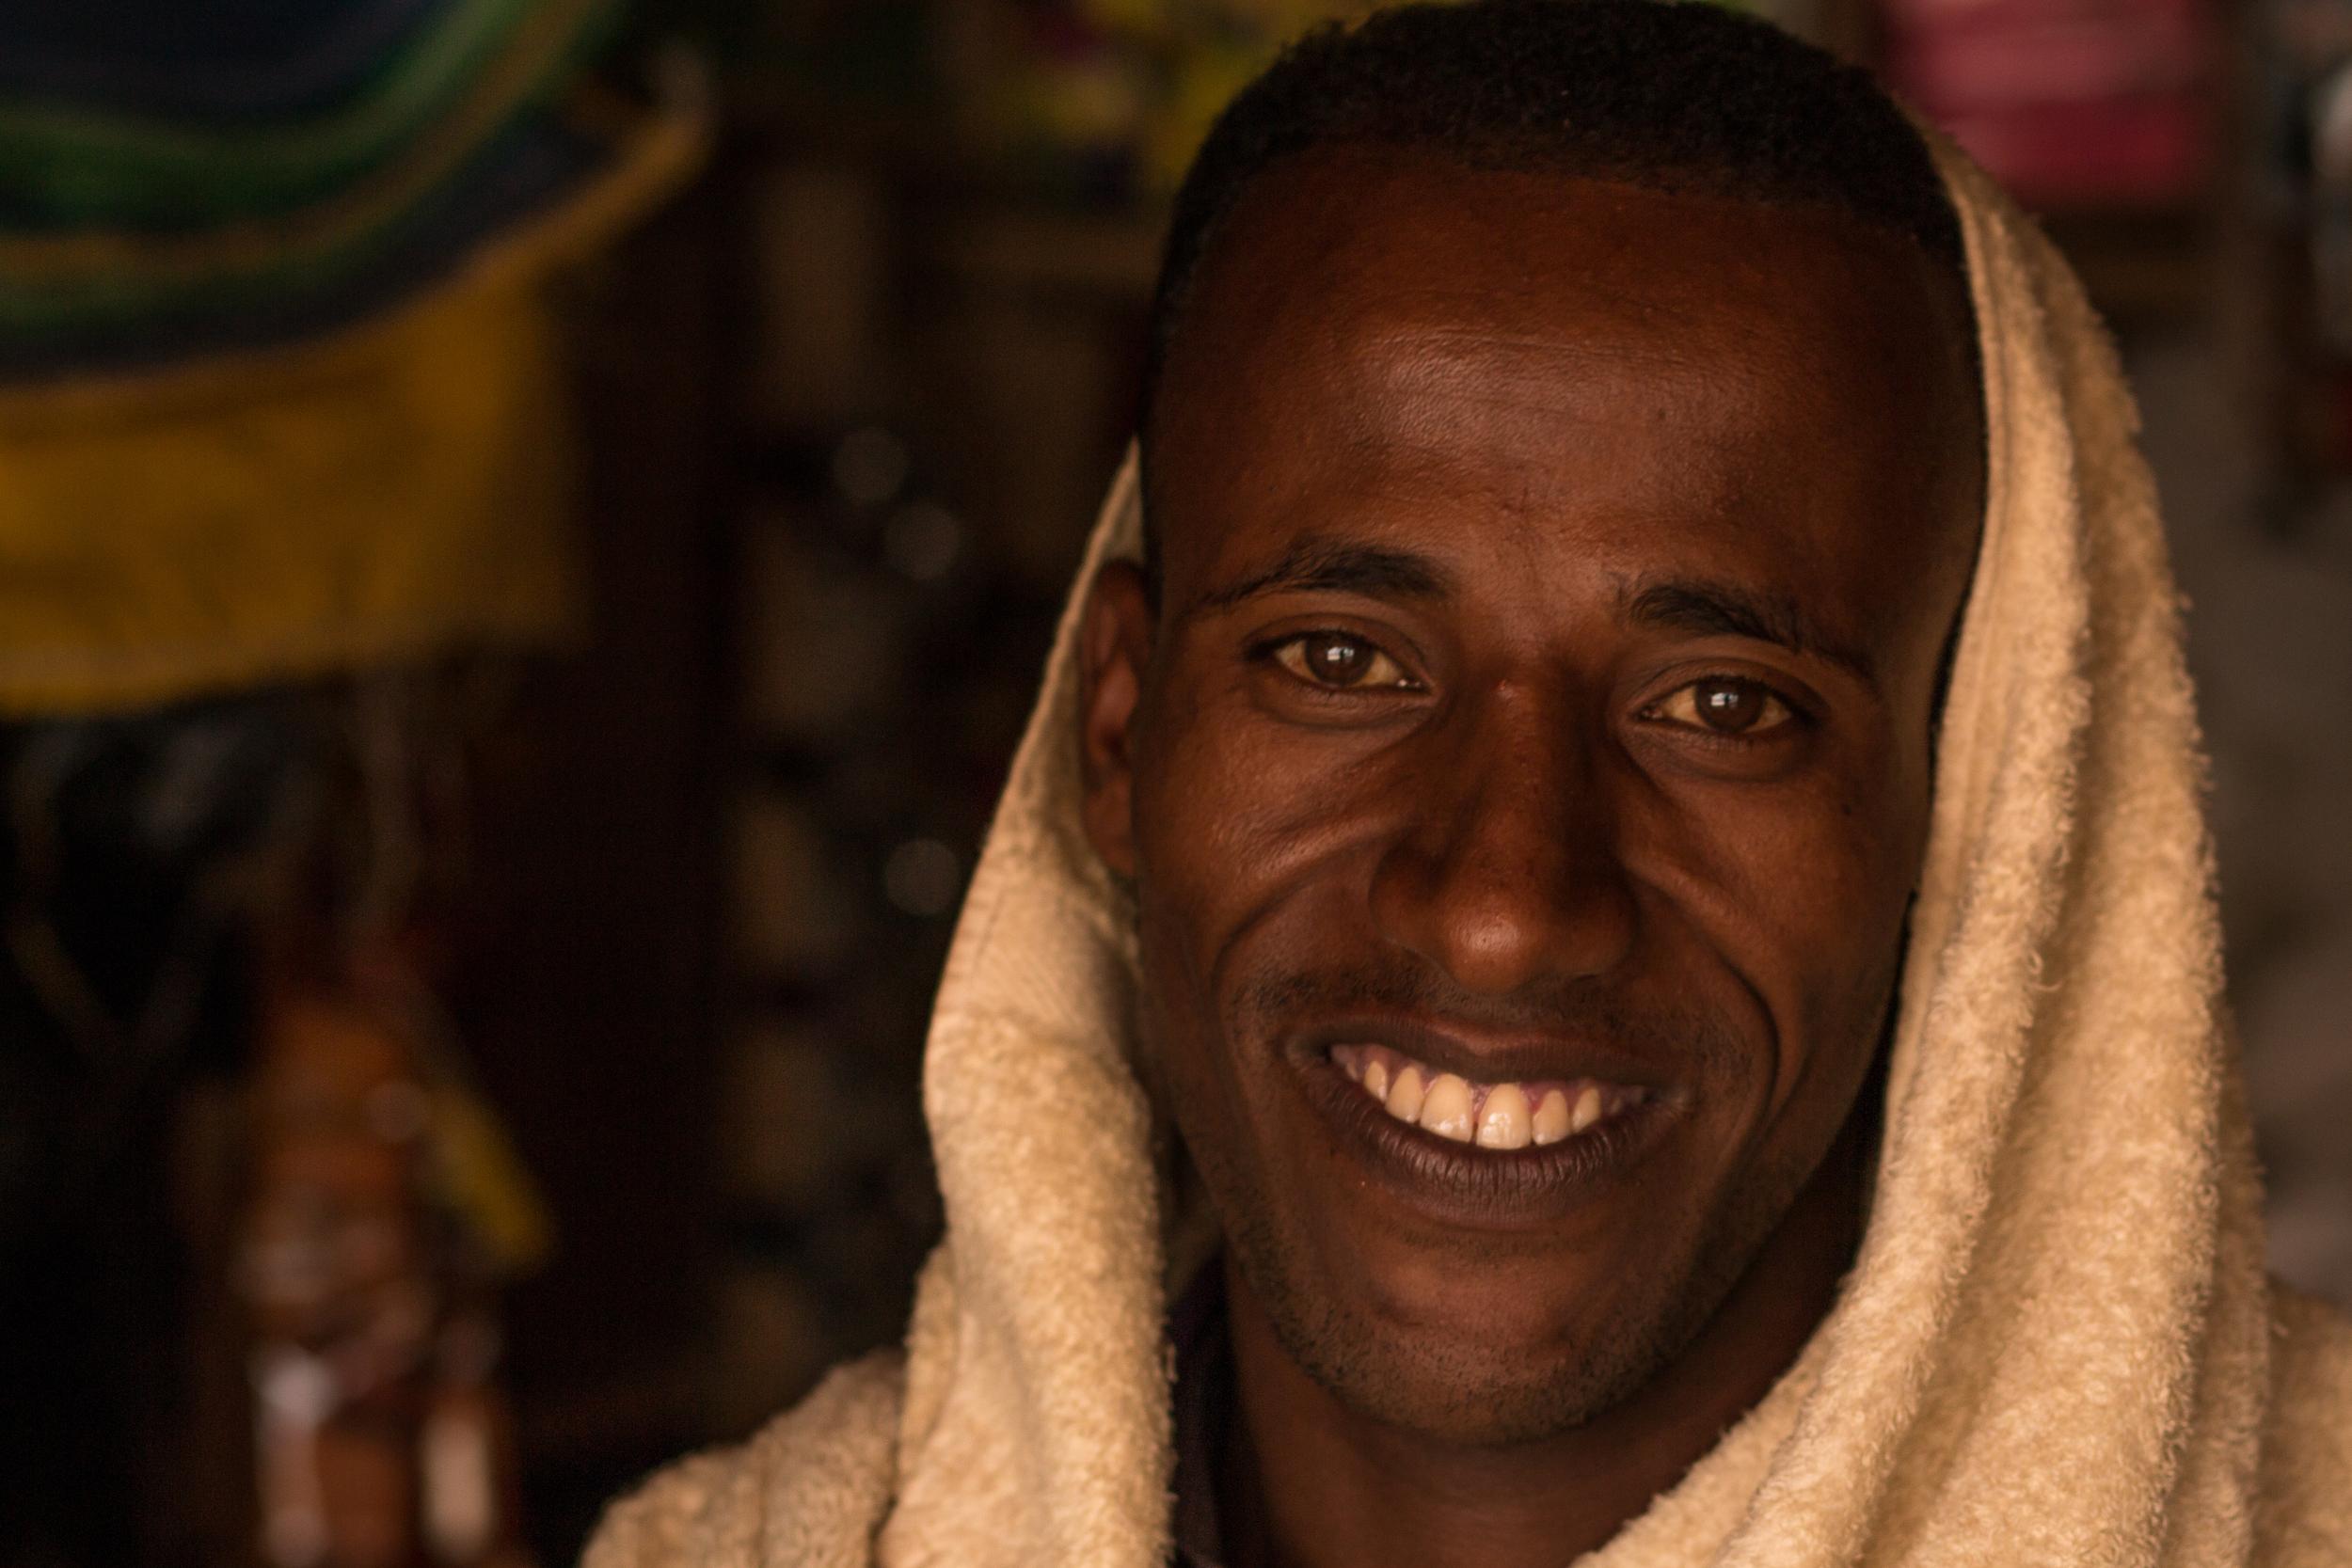 ethiopia_portraits-8727.JPG